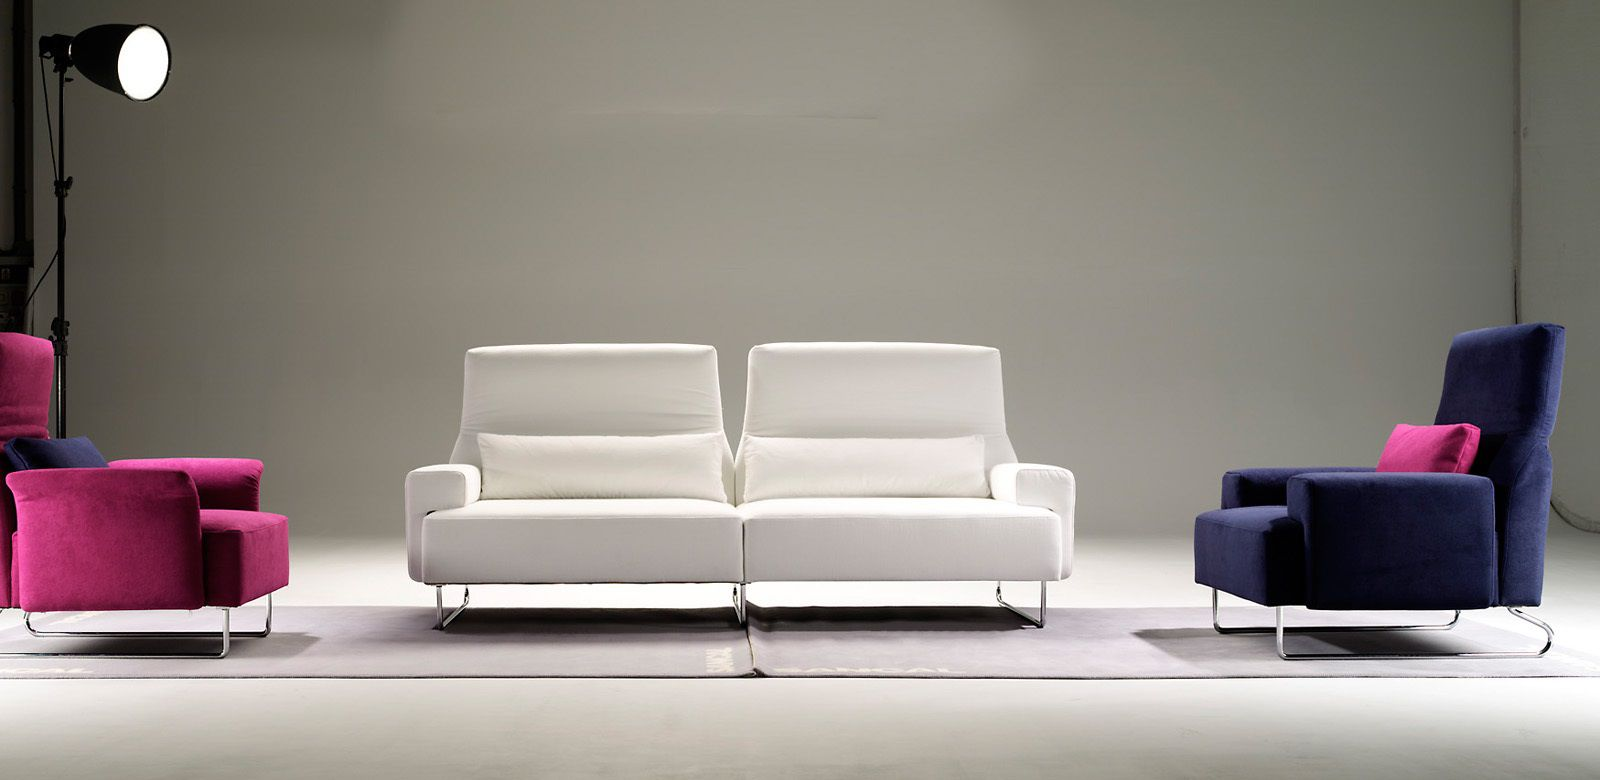 Designer Sofas Sancal